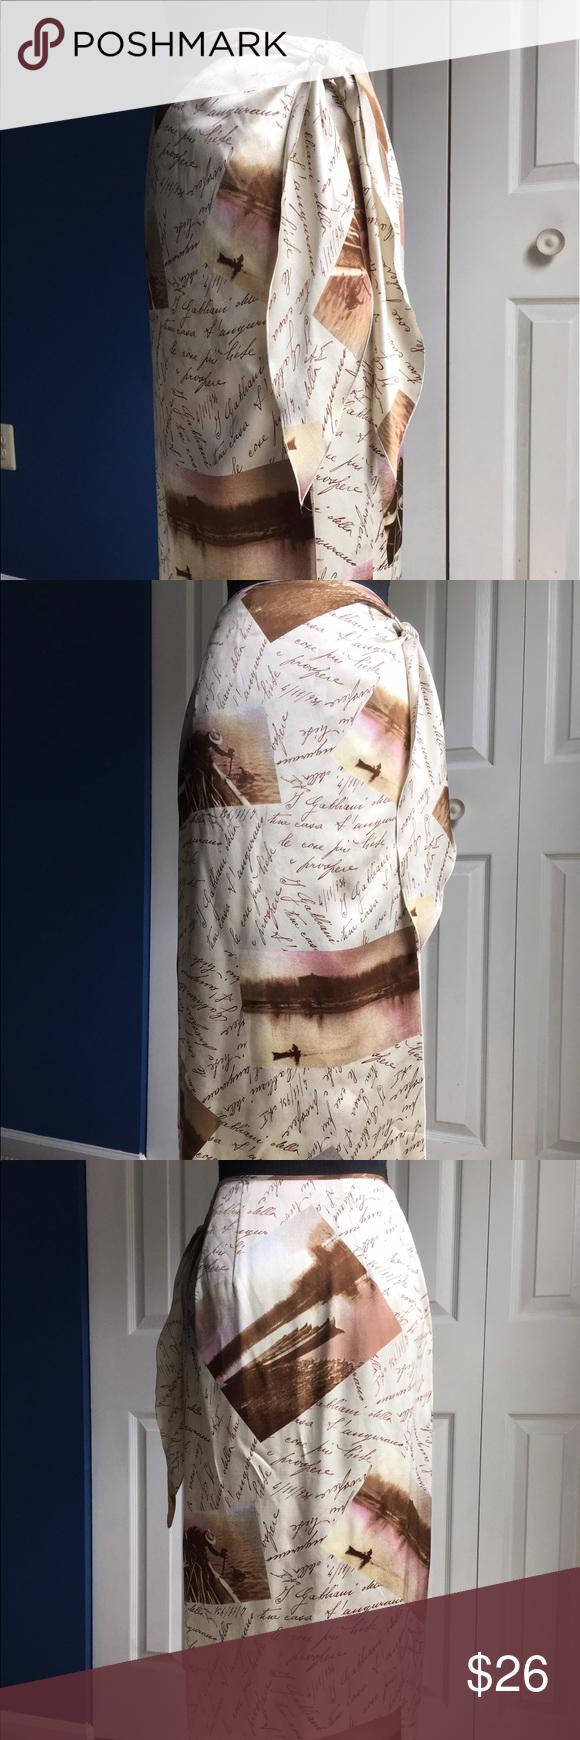 "Mariella Burani silk wrap skirt 100% silk made in Italy, wrap skirt, perfect for hot summer days. 33"" long Mariella Burani Swim Sarongs"